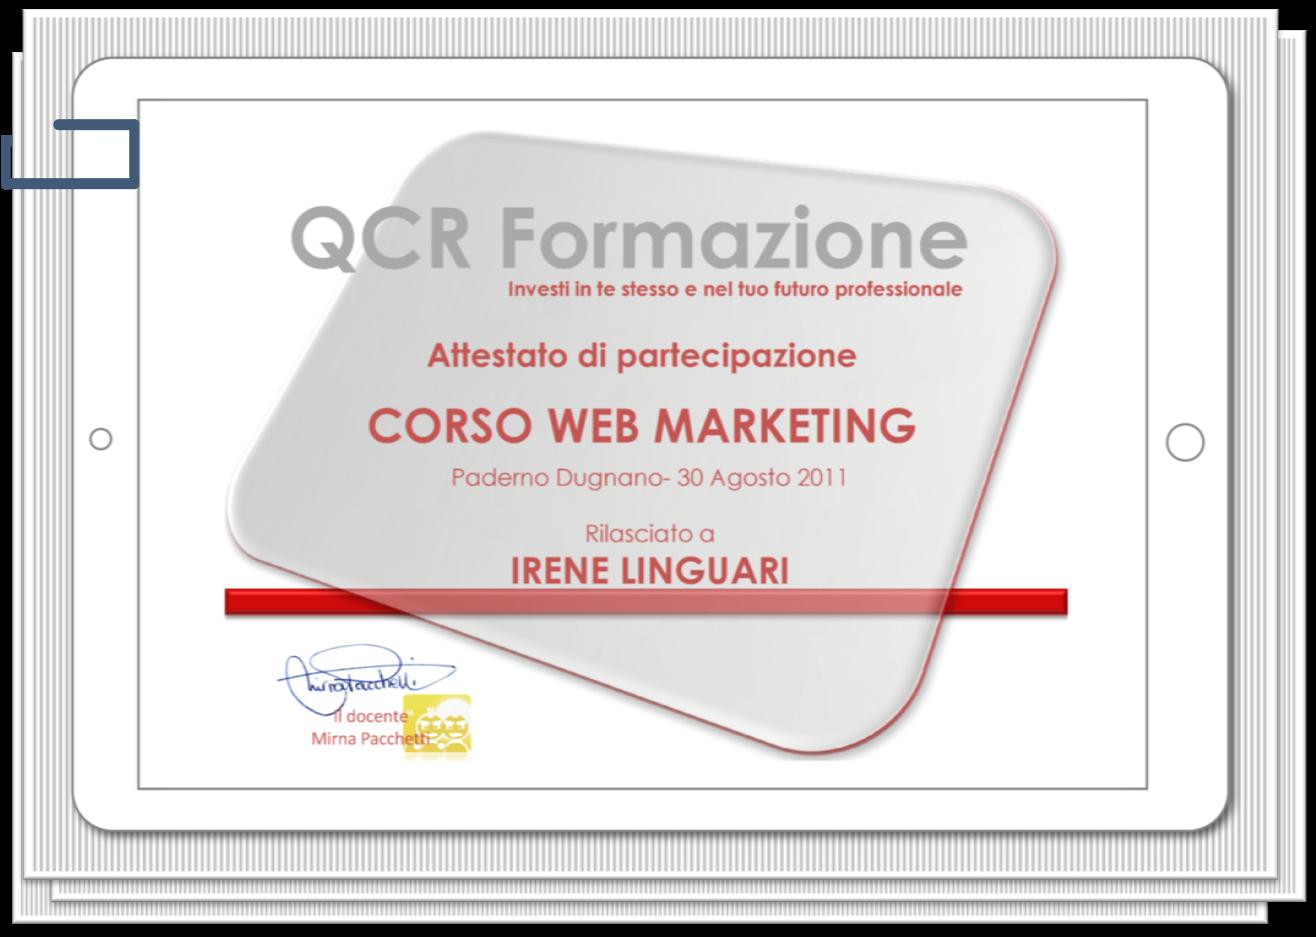 IreneLinguari_AssistenteDallaAallaZeta_About_Irene_02_Formazione_Marketing_WebMarketing_Qcr_att